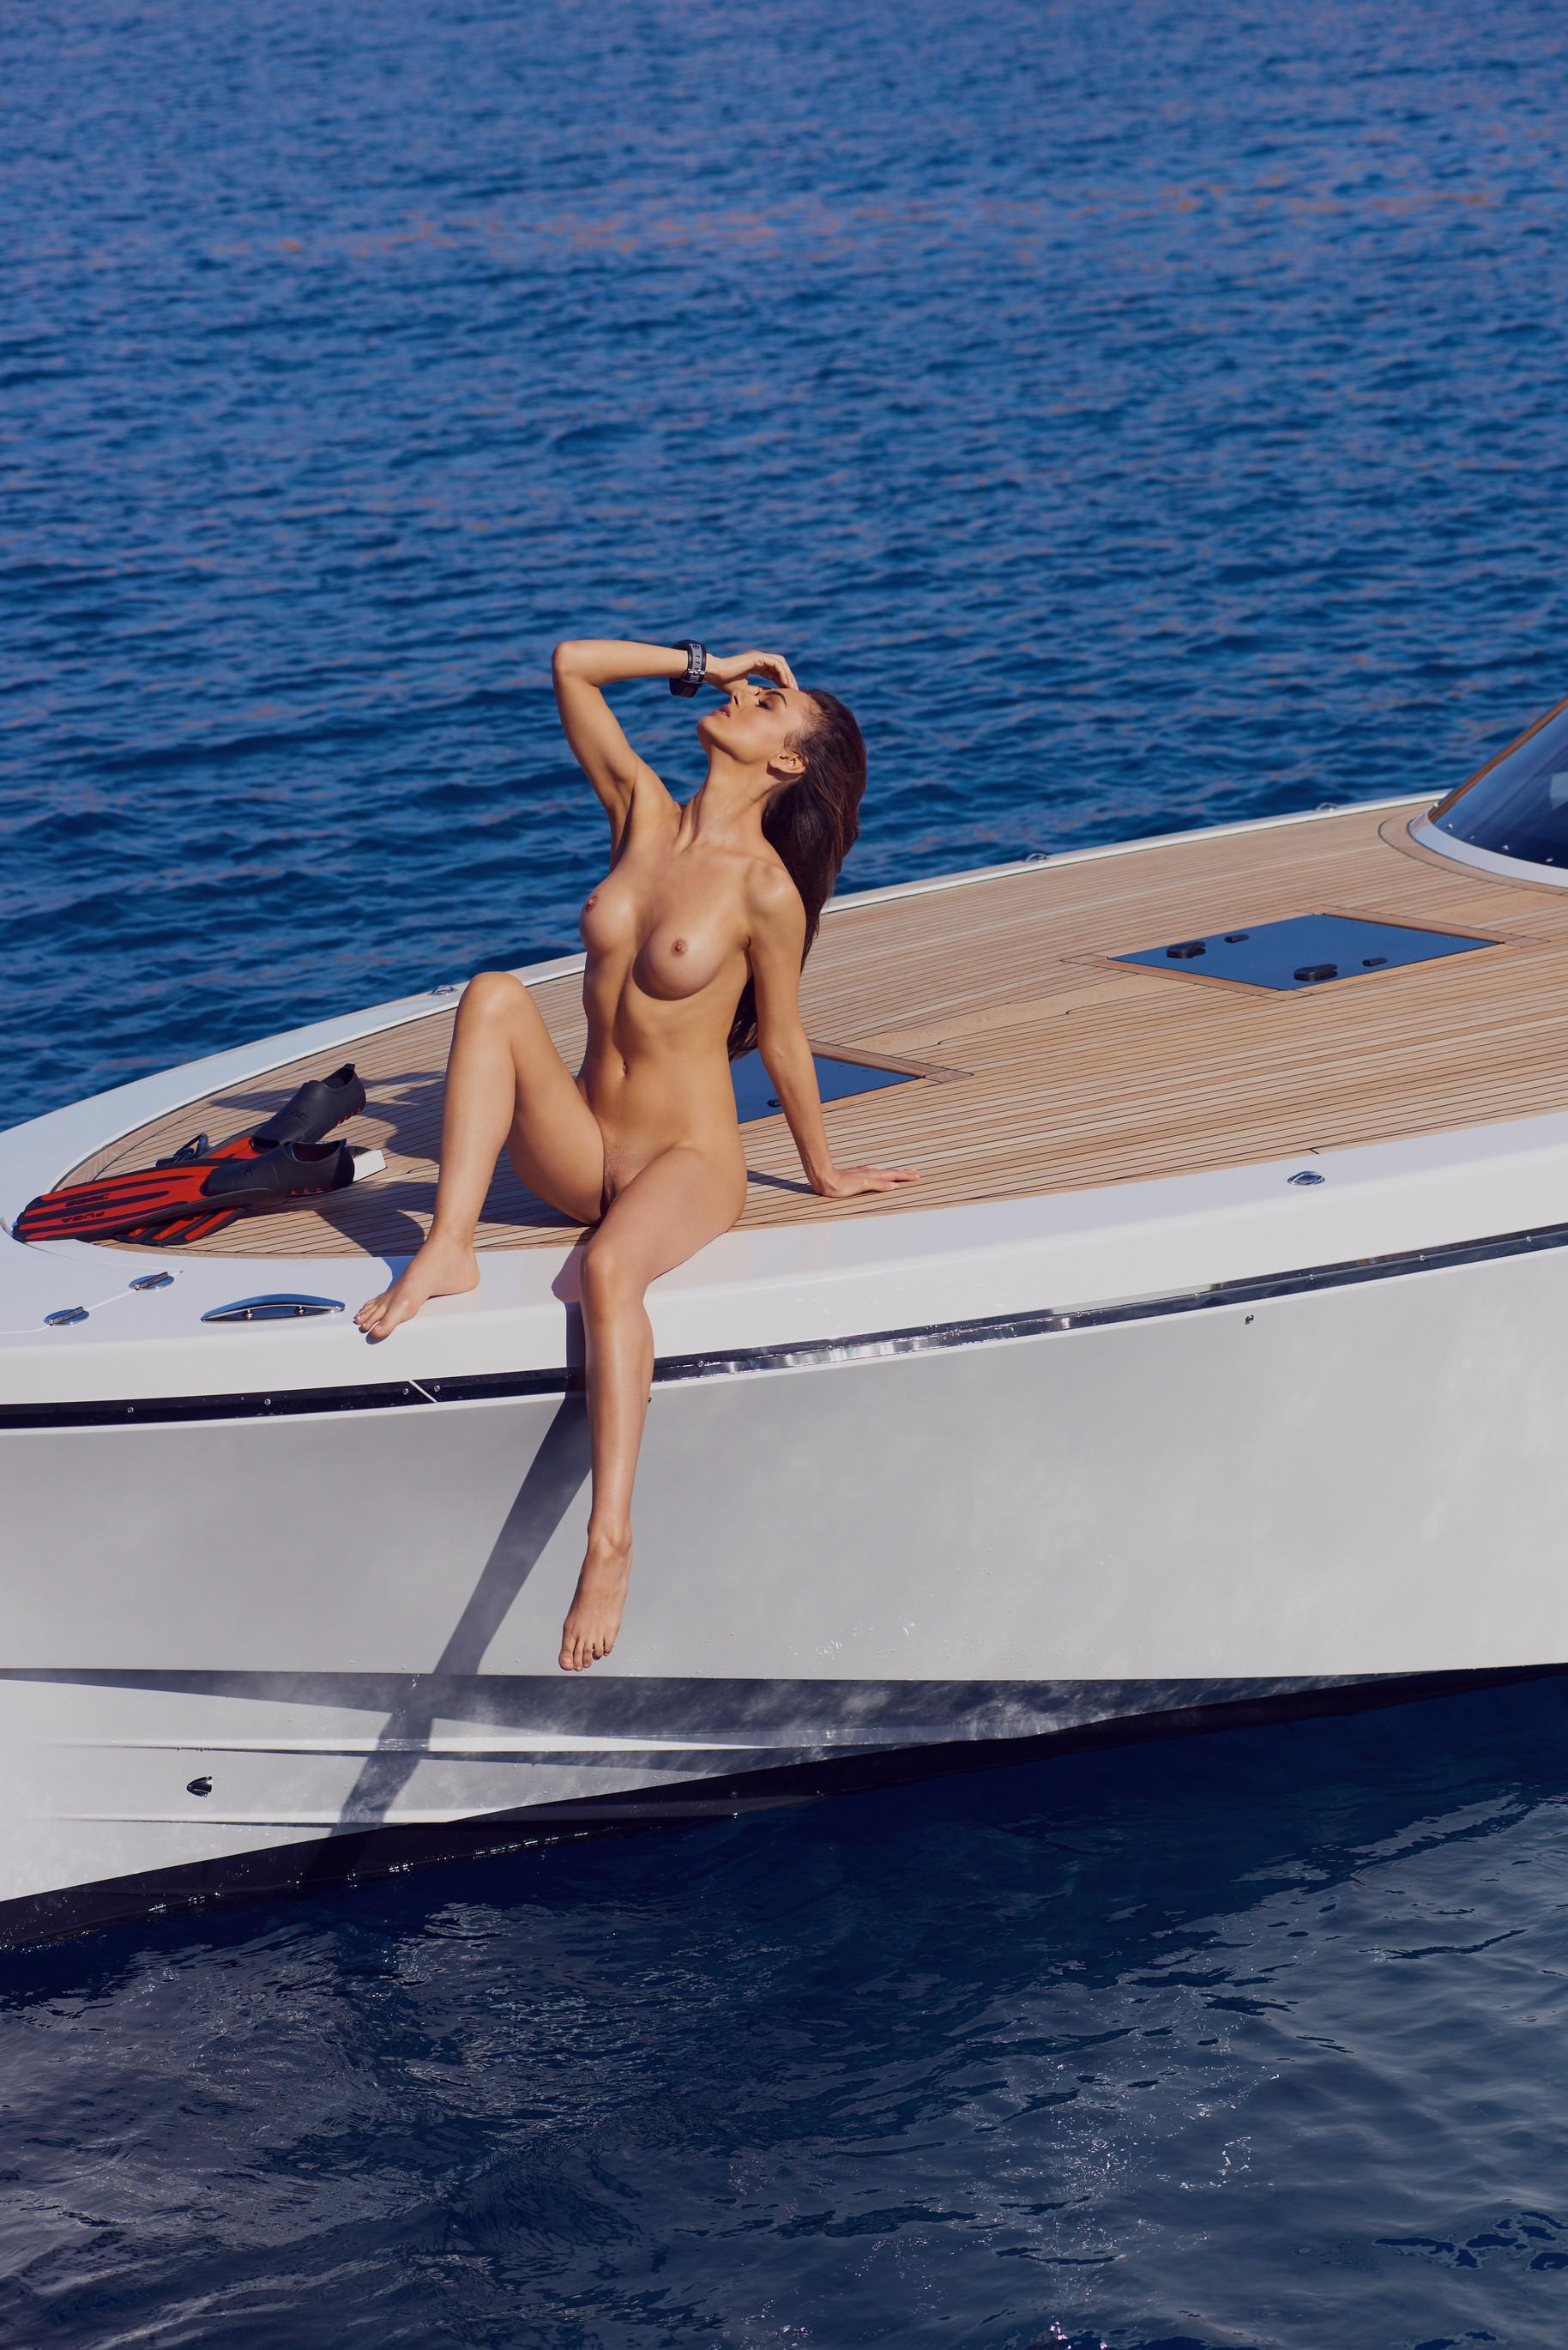 veronika-klimovits-naked-diving-motorboat-seaside-playboy-03